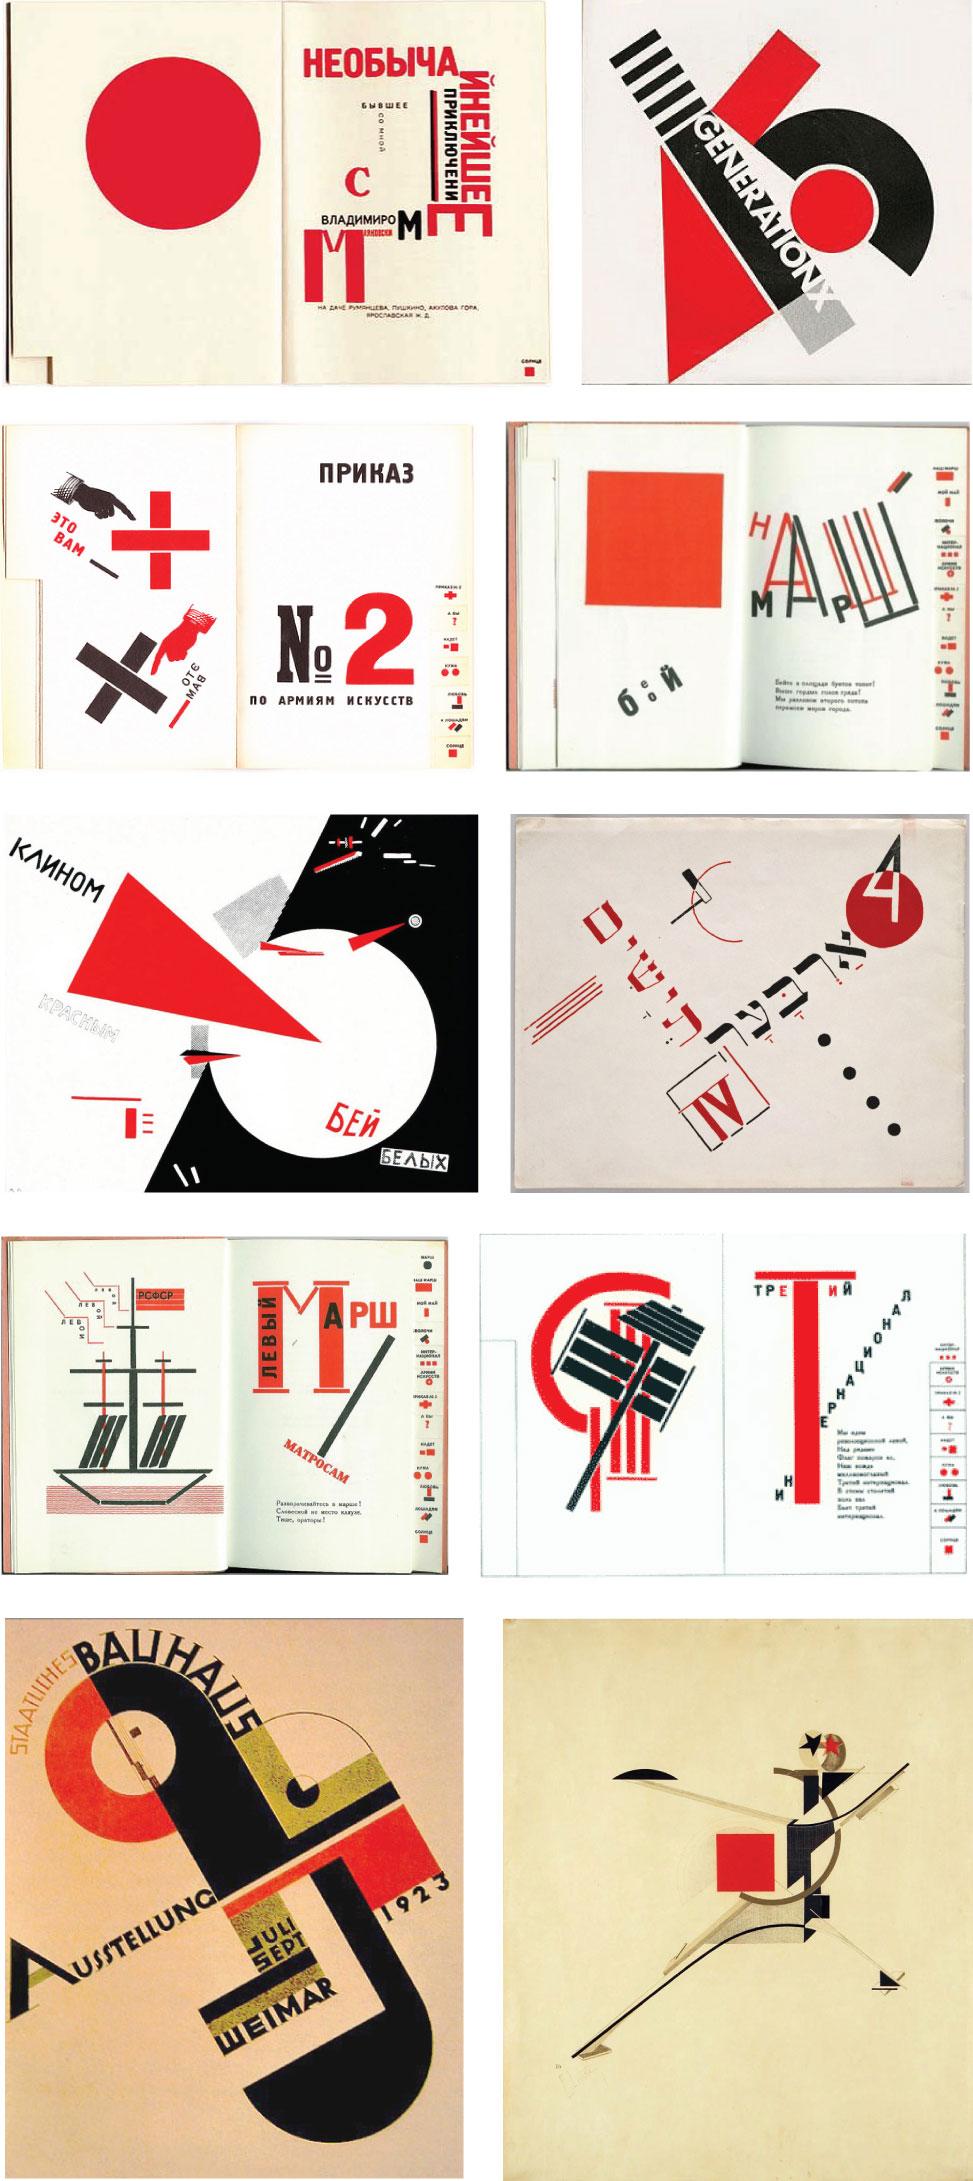 El Lissitzky(Lazar Markovich Lissitzky) 1890–1941